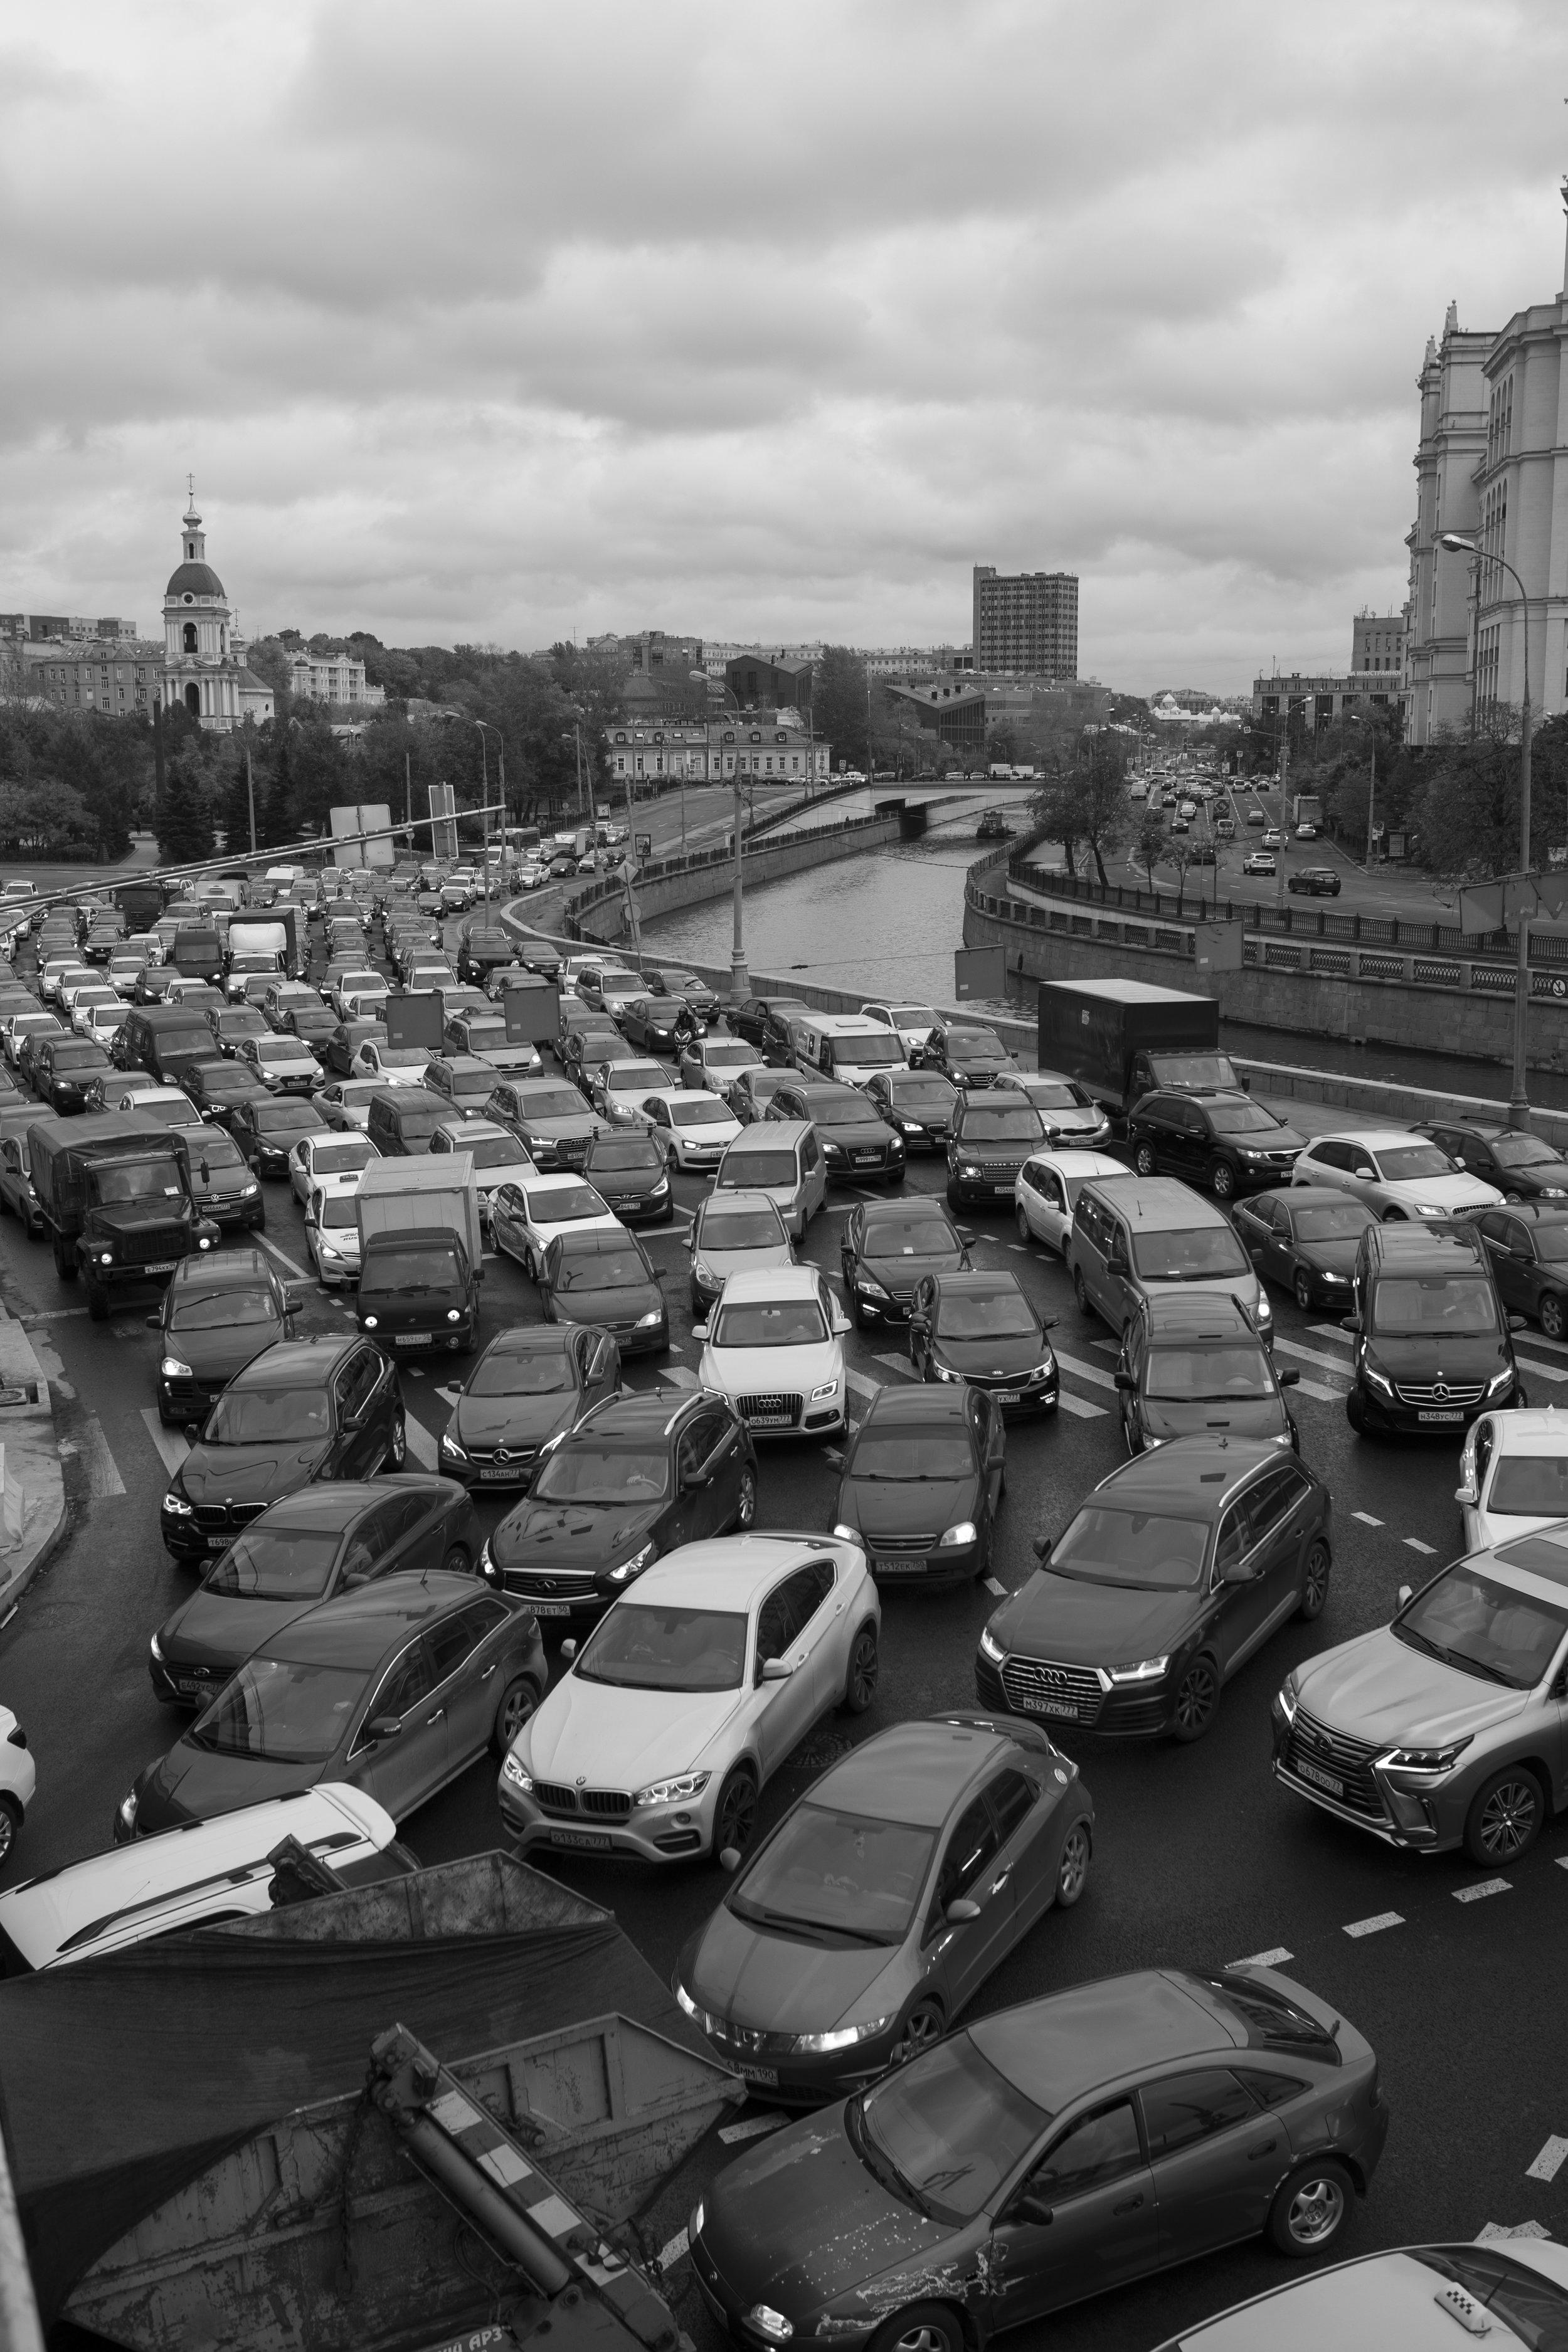 Moskau_Moscow_Soviet_Russia (4).JPG